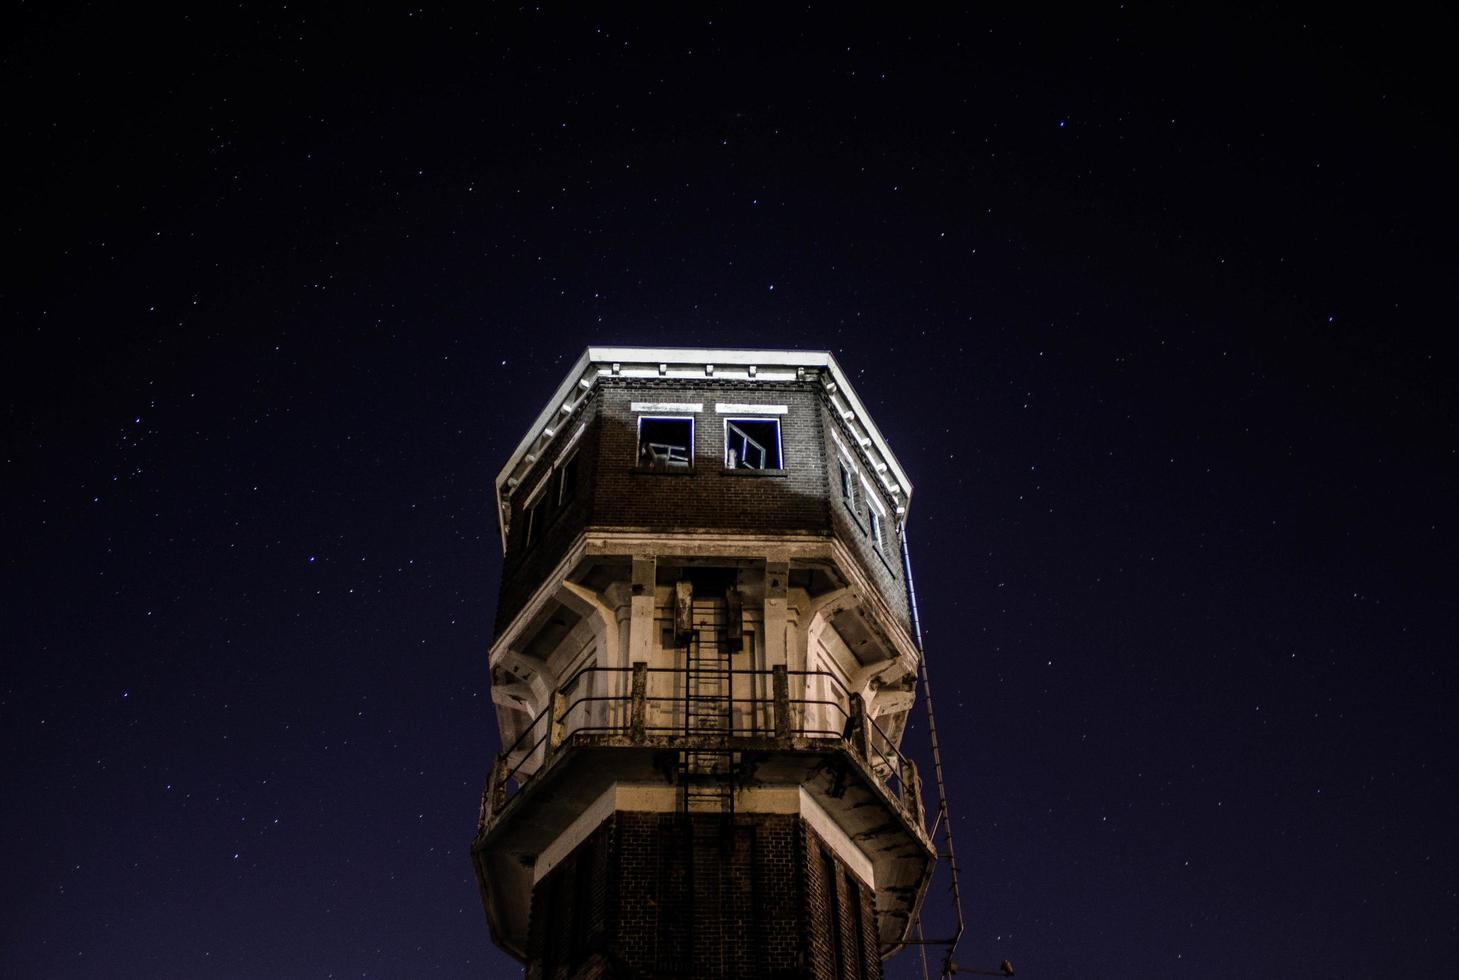 bruges, belgio, 2020 - parte superiore del campanile di bruges di notte foto